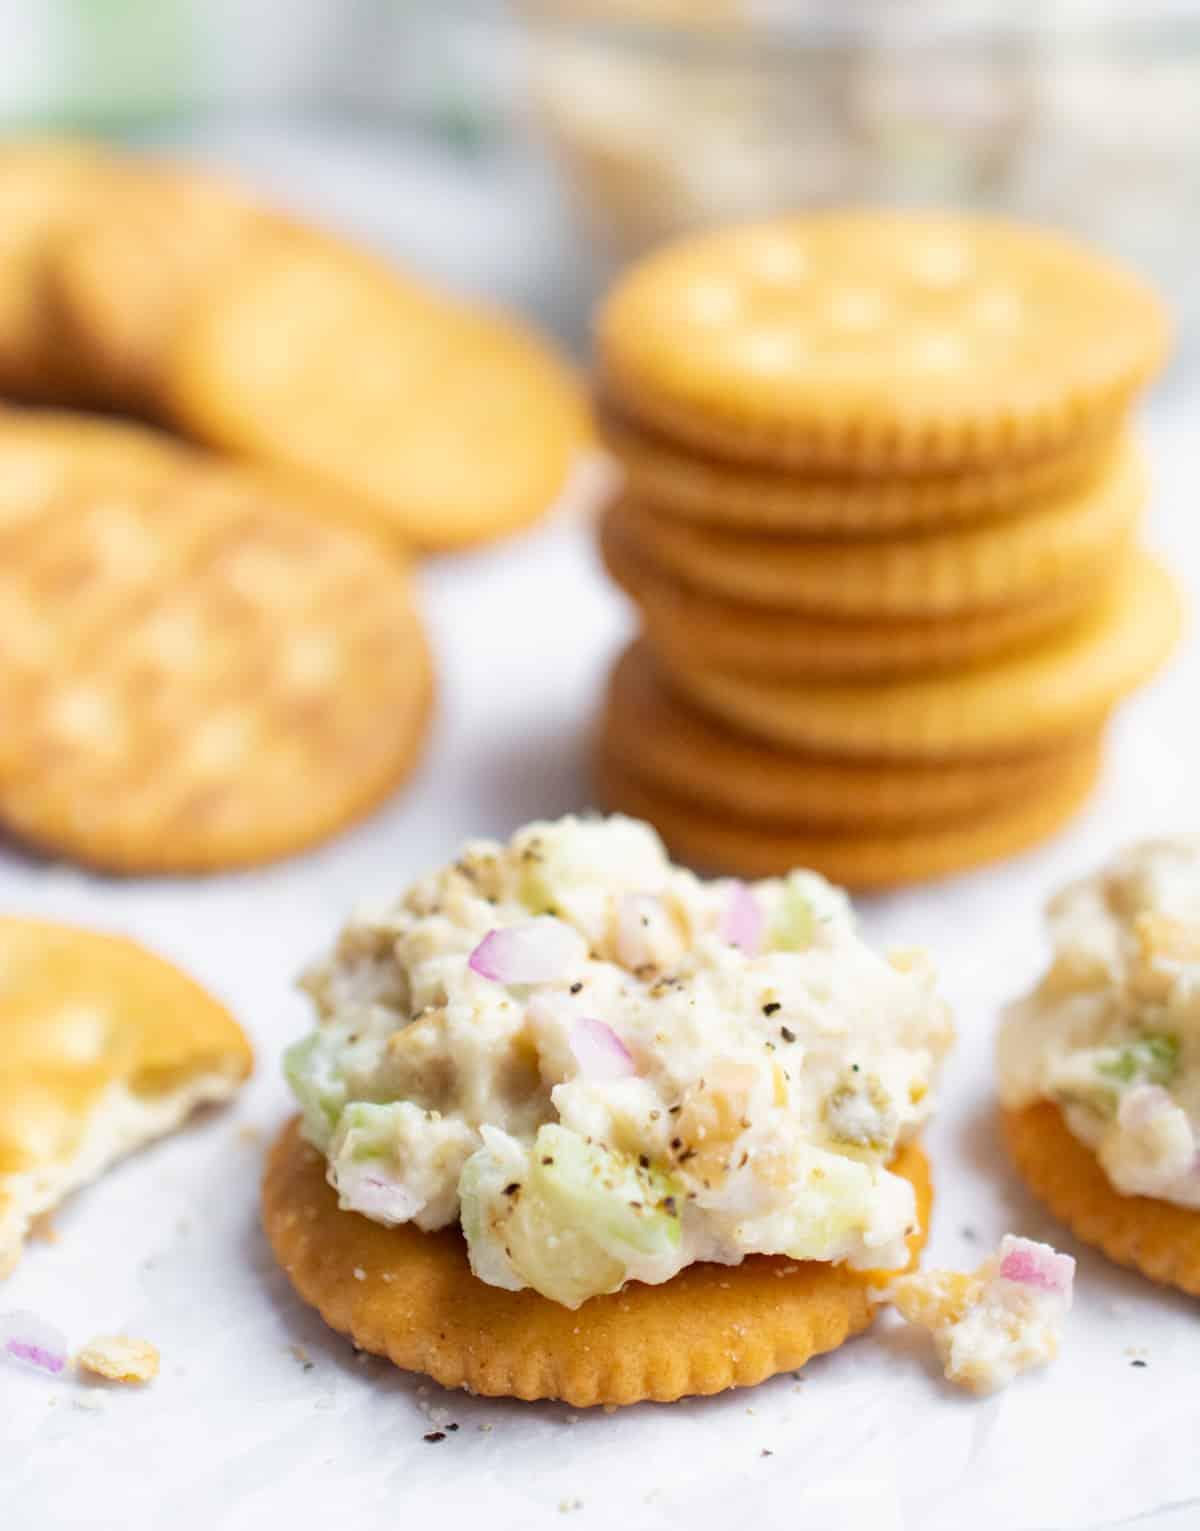 Vegan tuna salad on crackers.